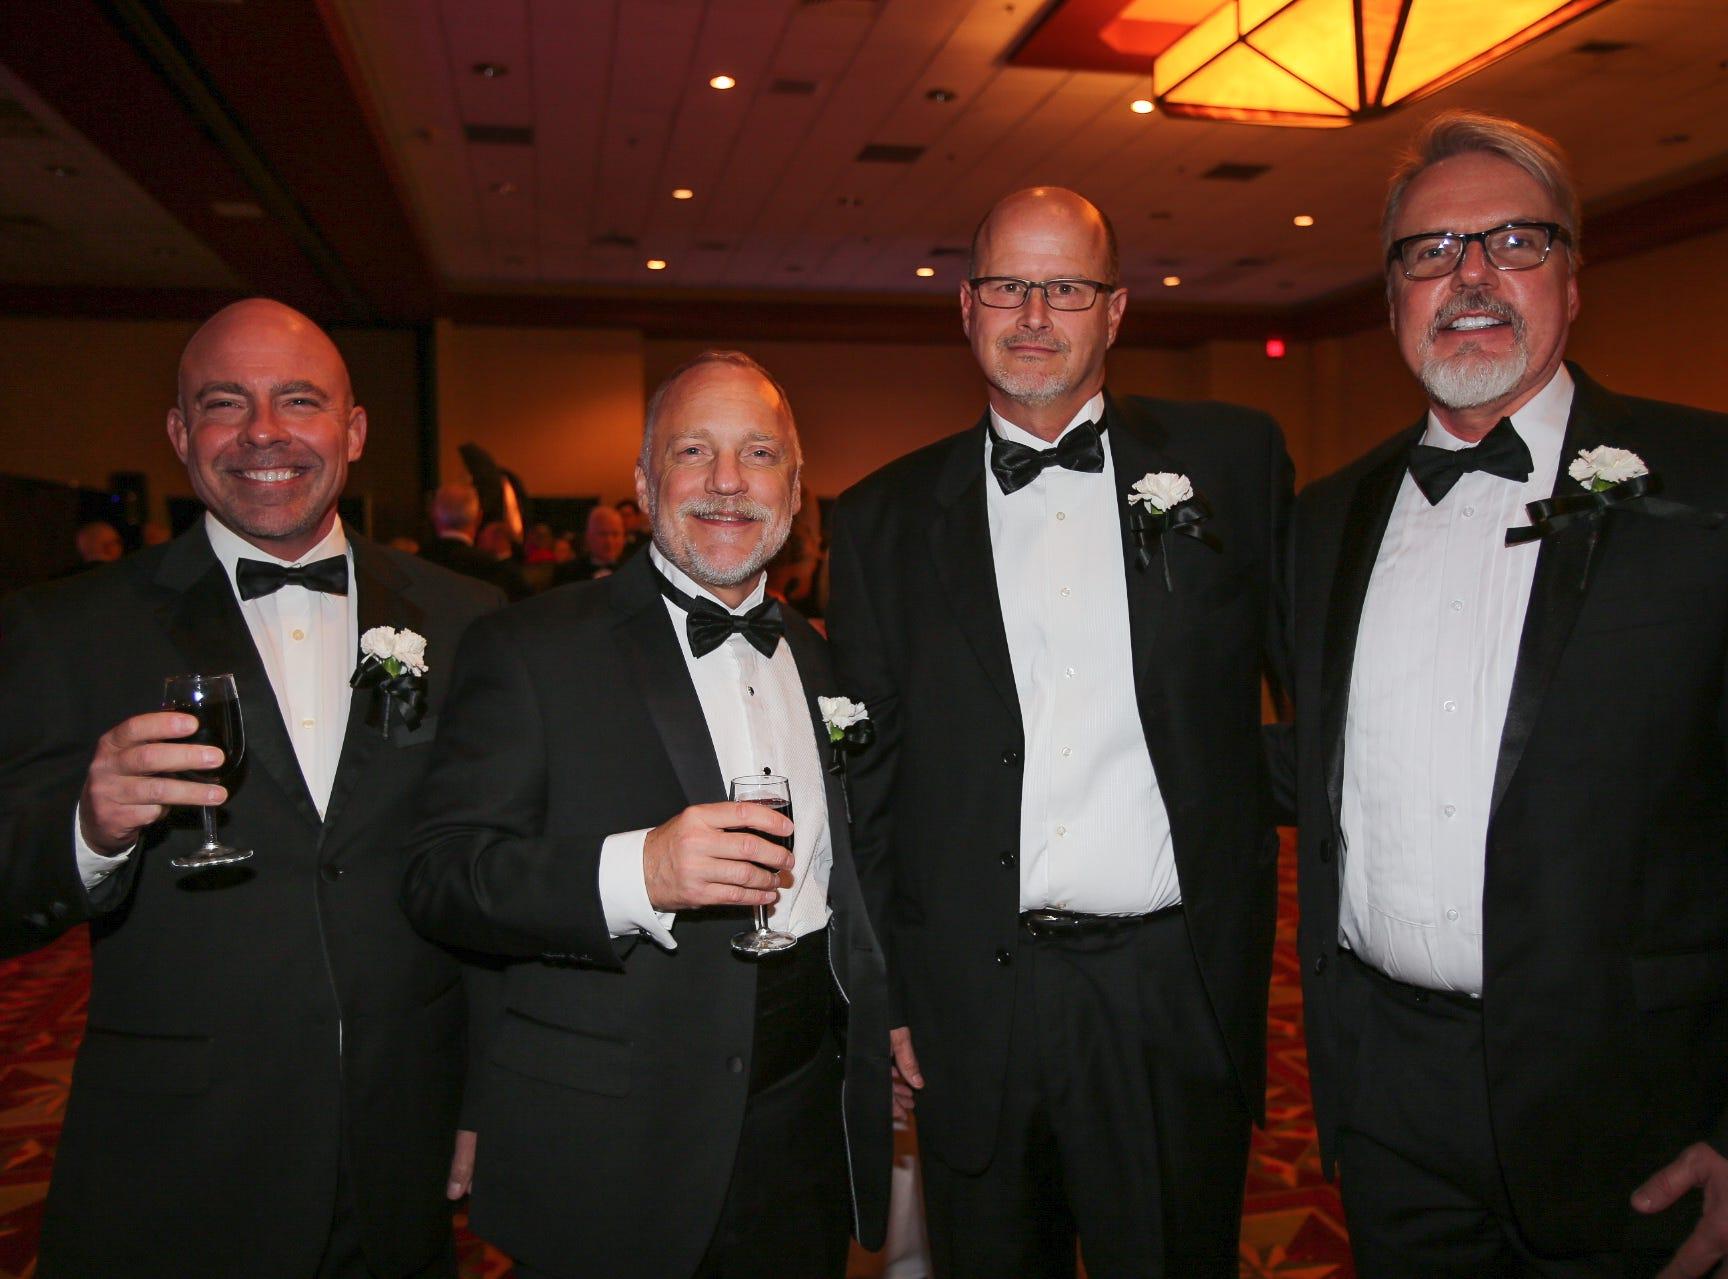 David, David, Jim, and David